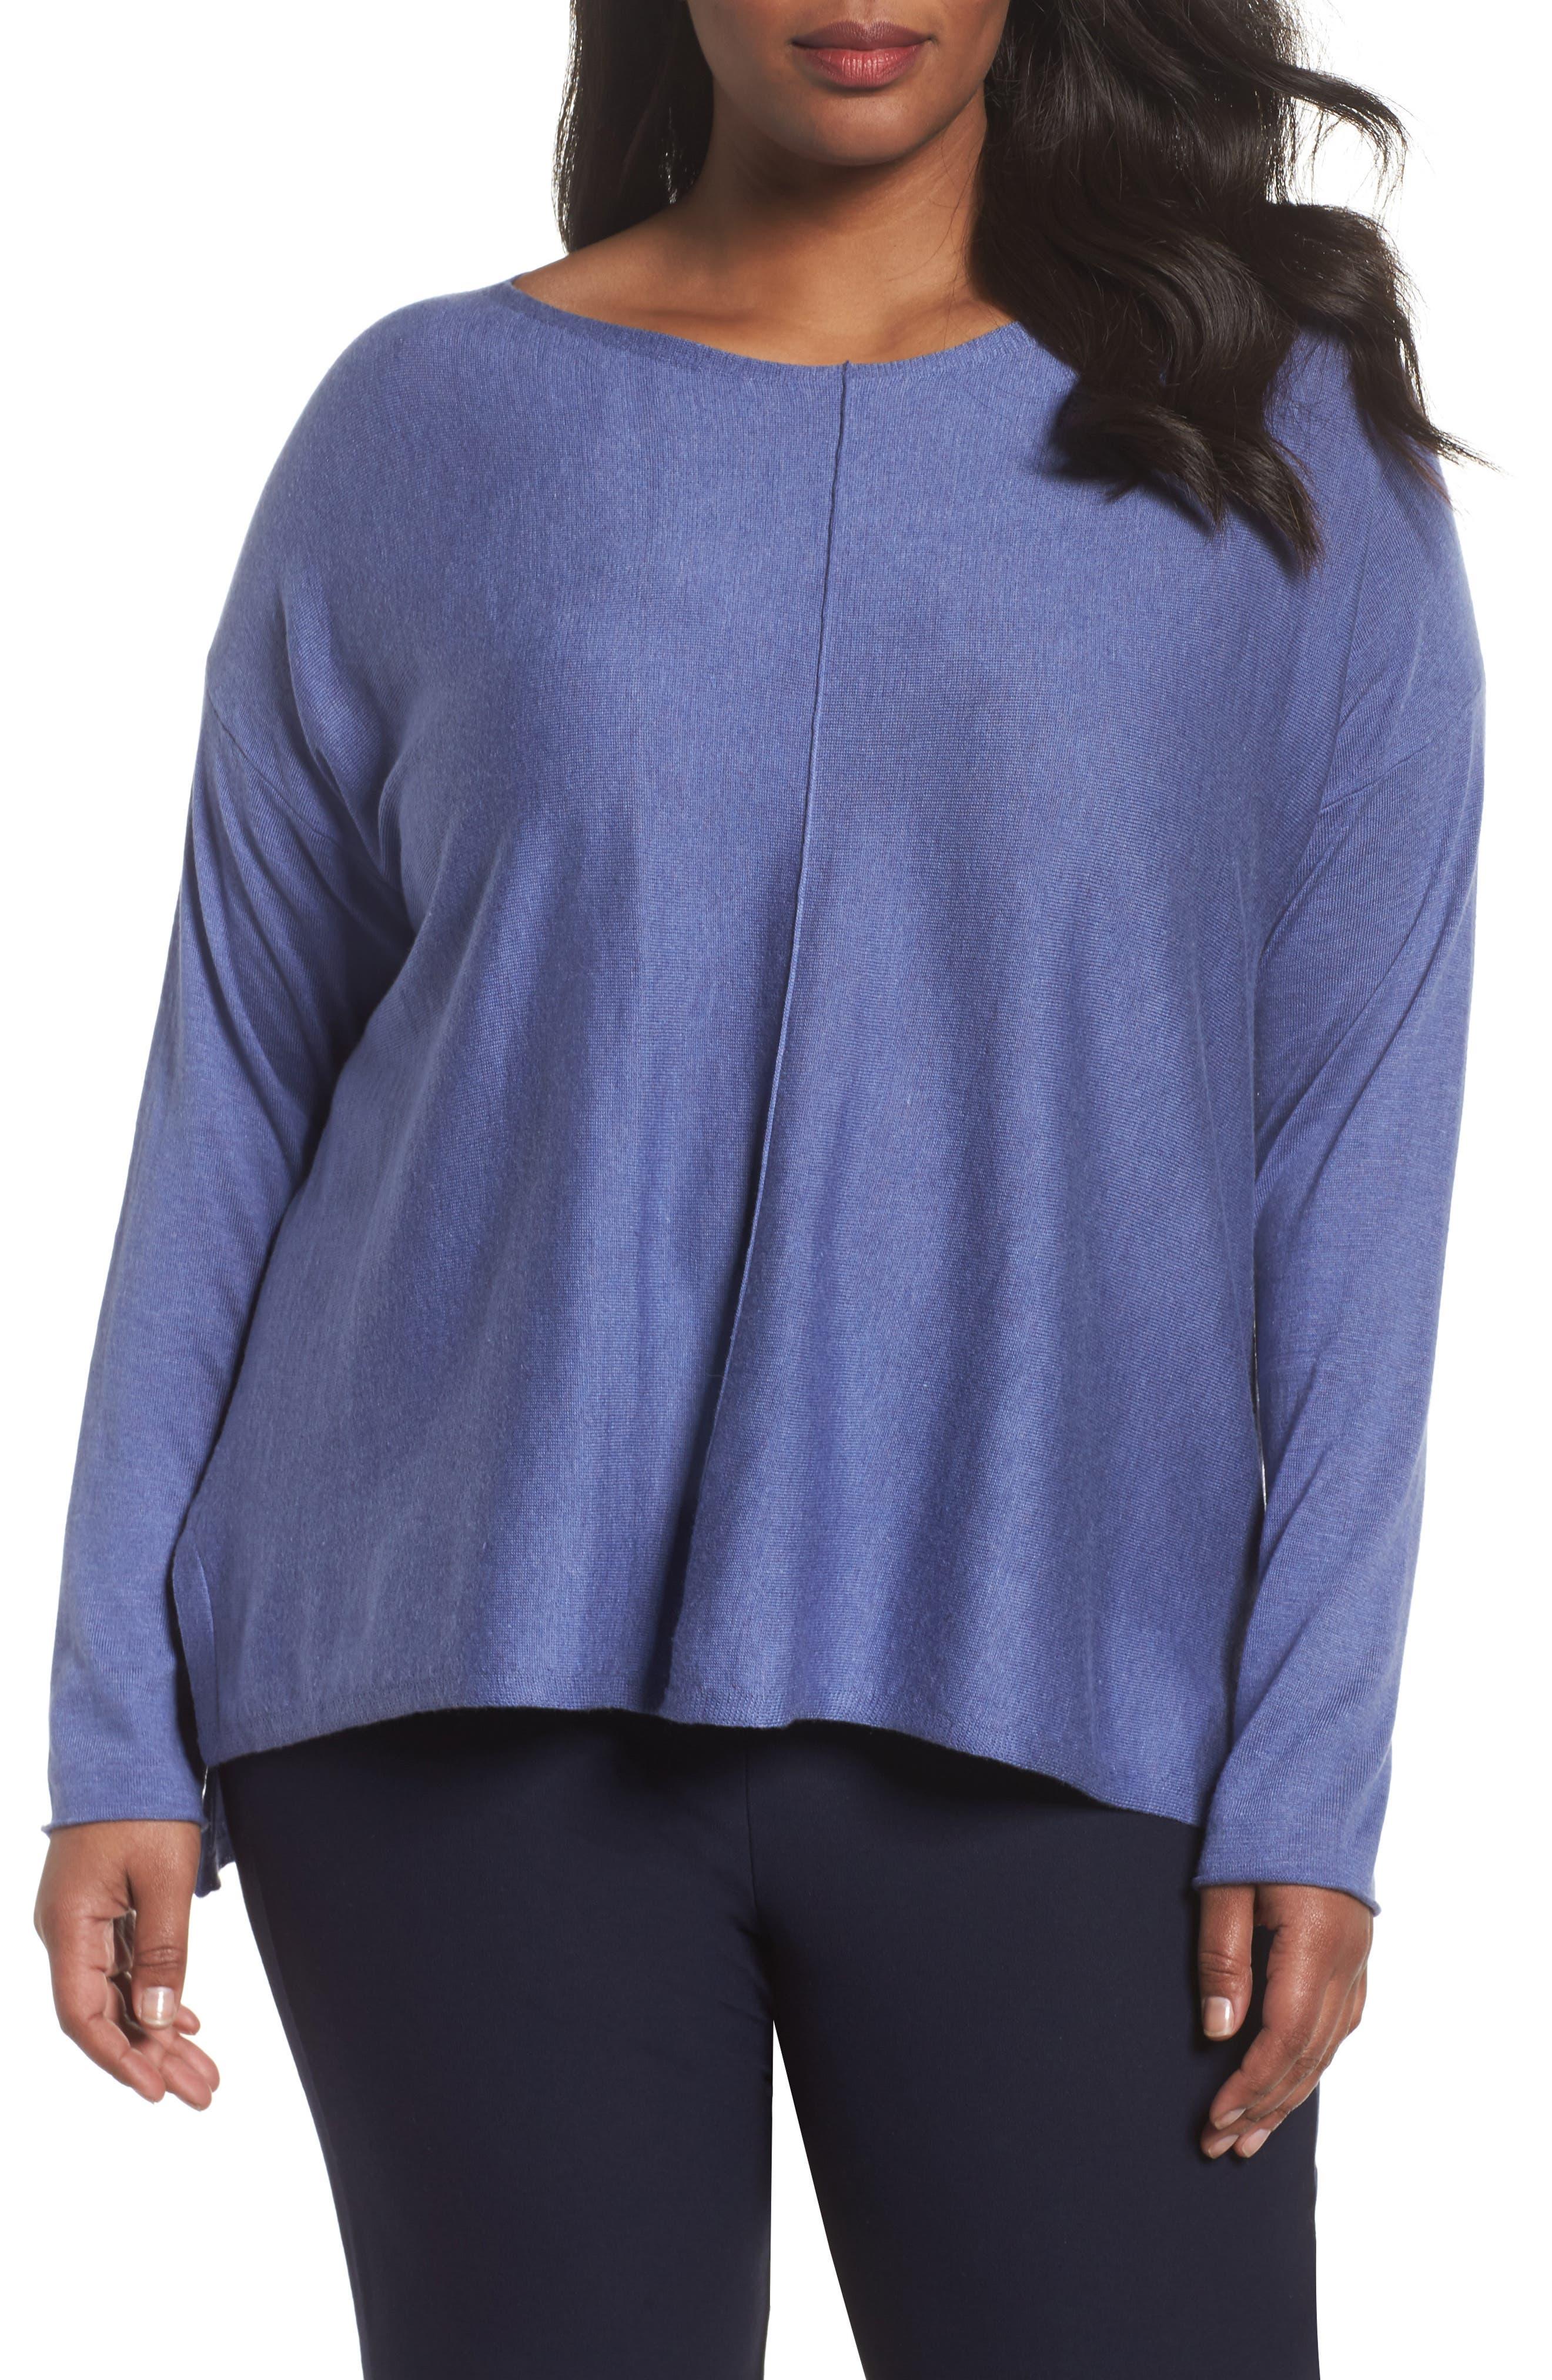 Main Image - Eileen Fisher Tencel® Lyocell Blend Sweater (Plus Size)